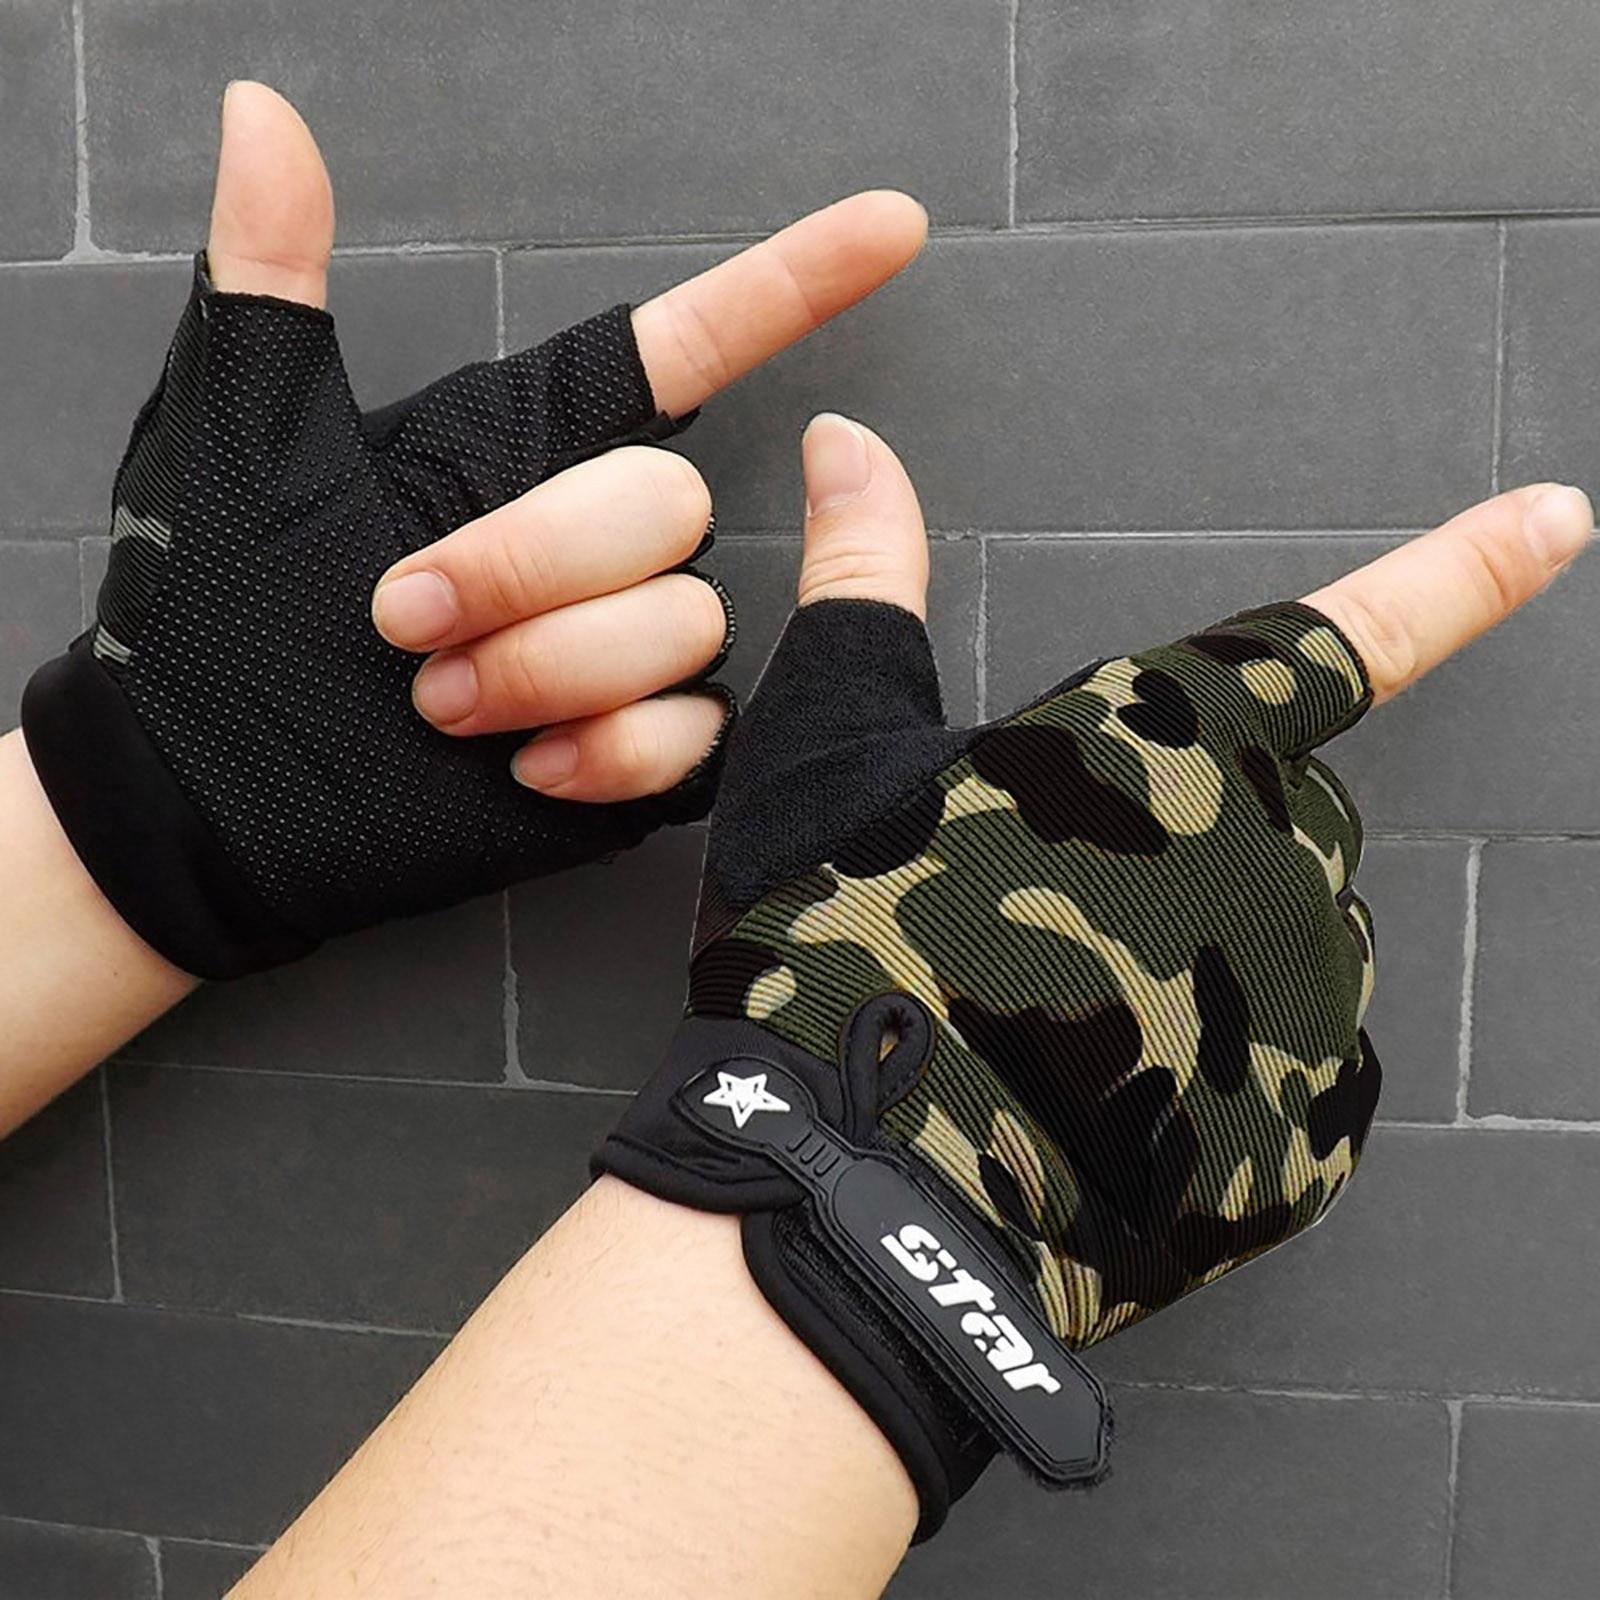 Shockproof GEL Pad Cycling Gloves Half Finger Sport Men Women Summer Bicycle Gym-Fitness MTB Bike